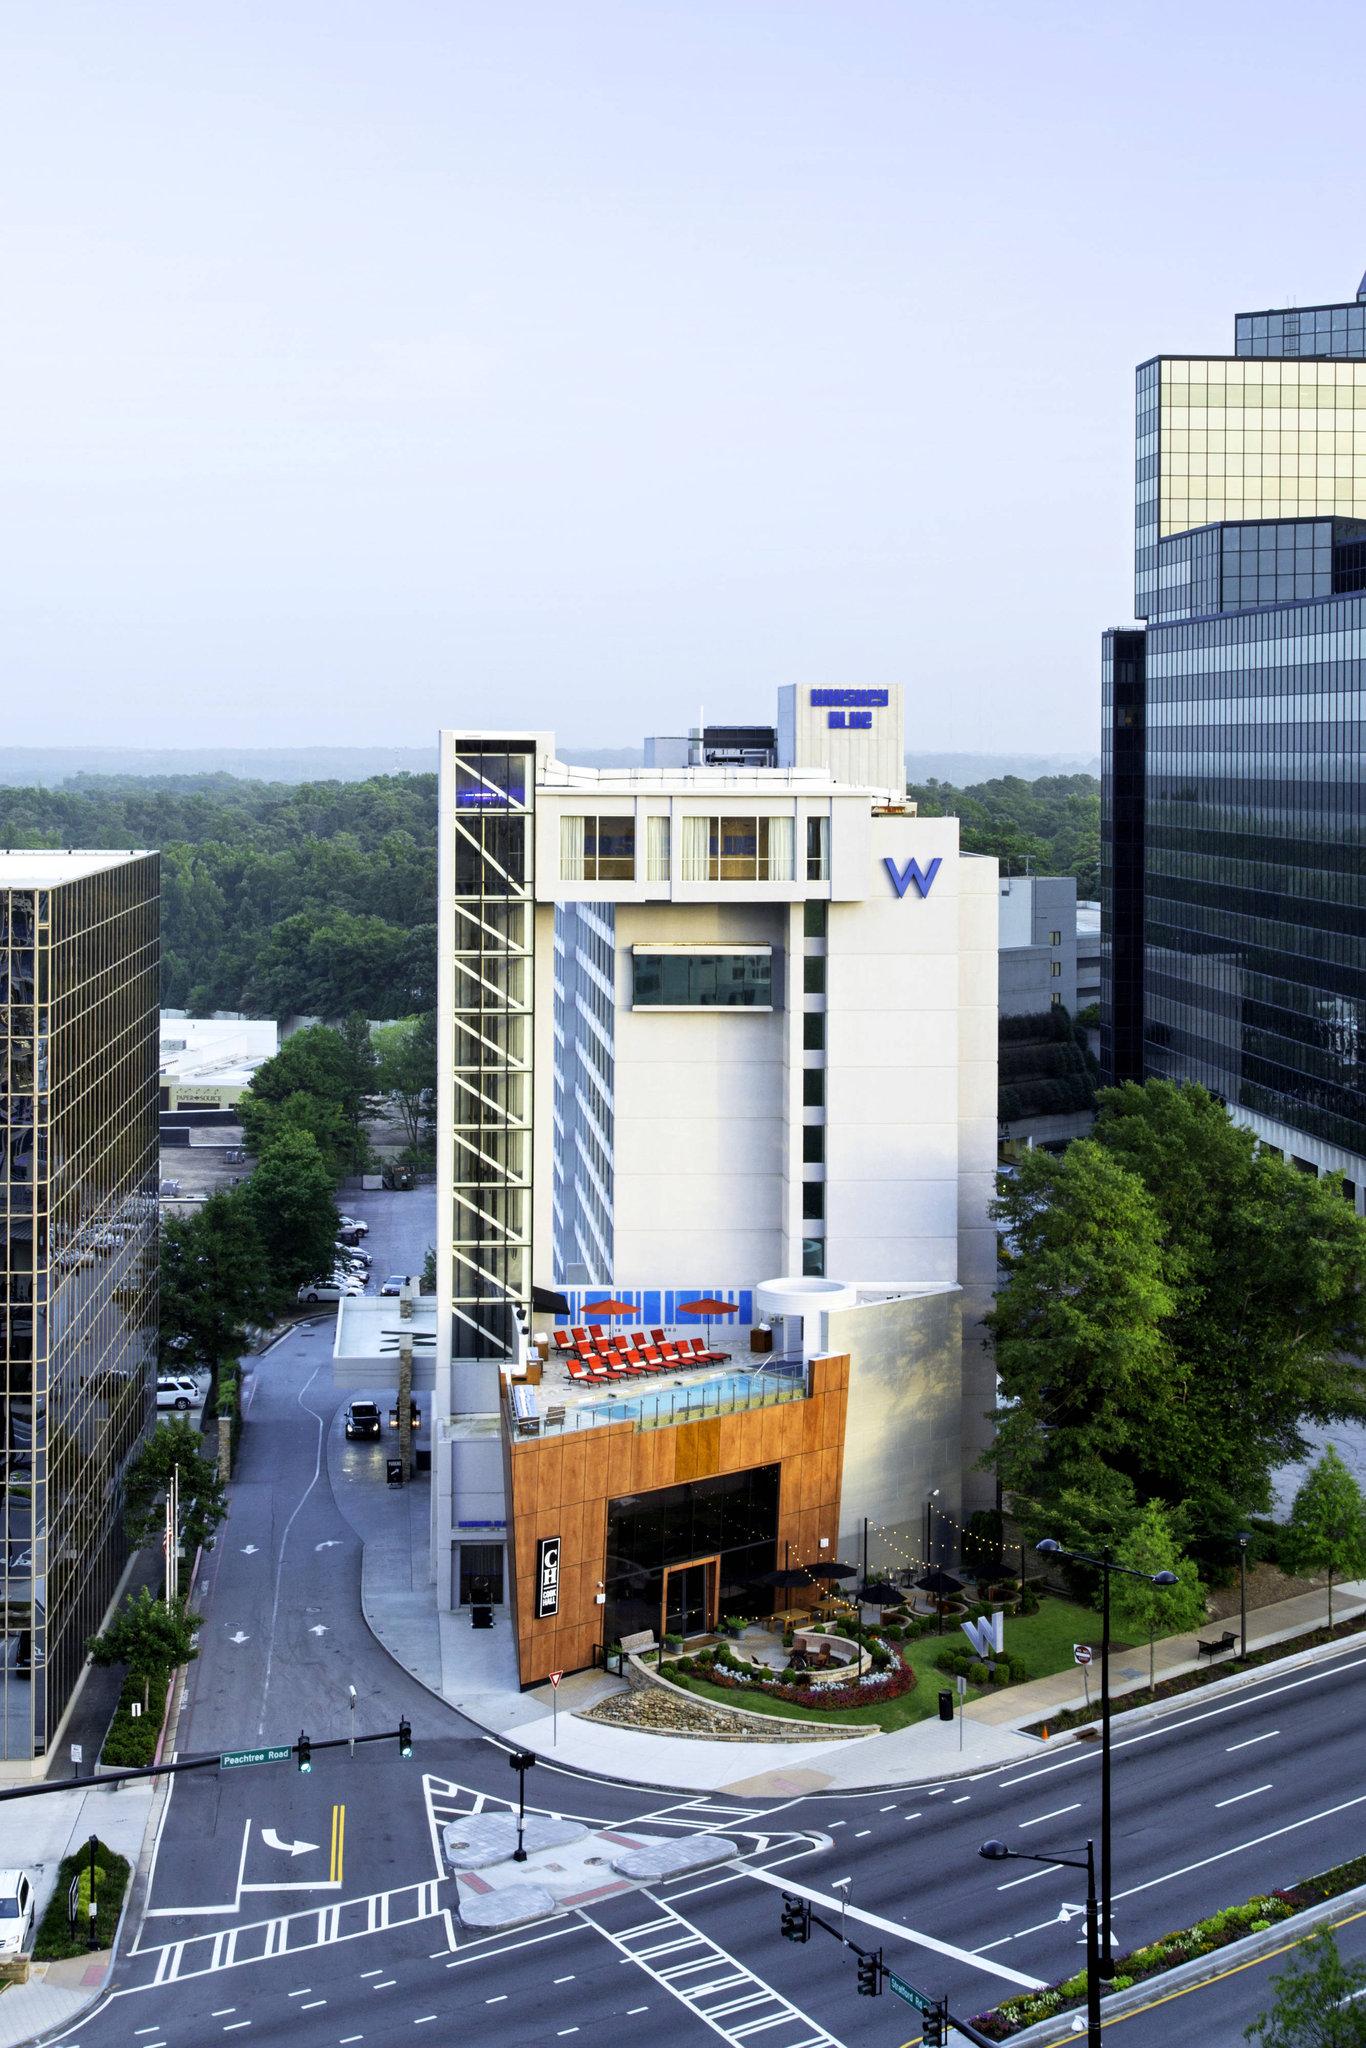 2b2b852292 Meetings and events at W Atlanta - Buckhead